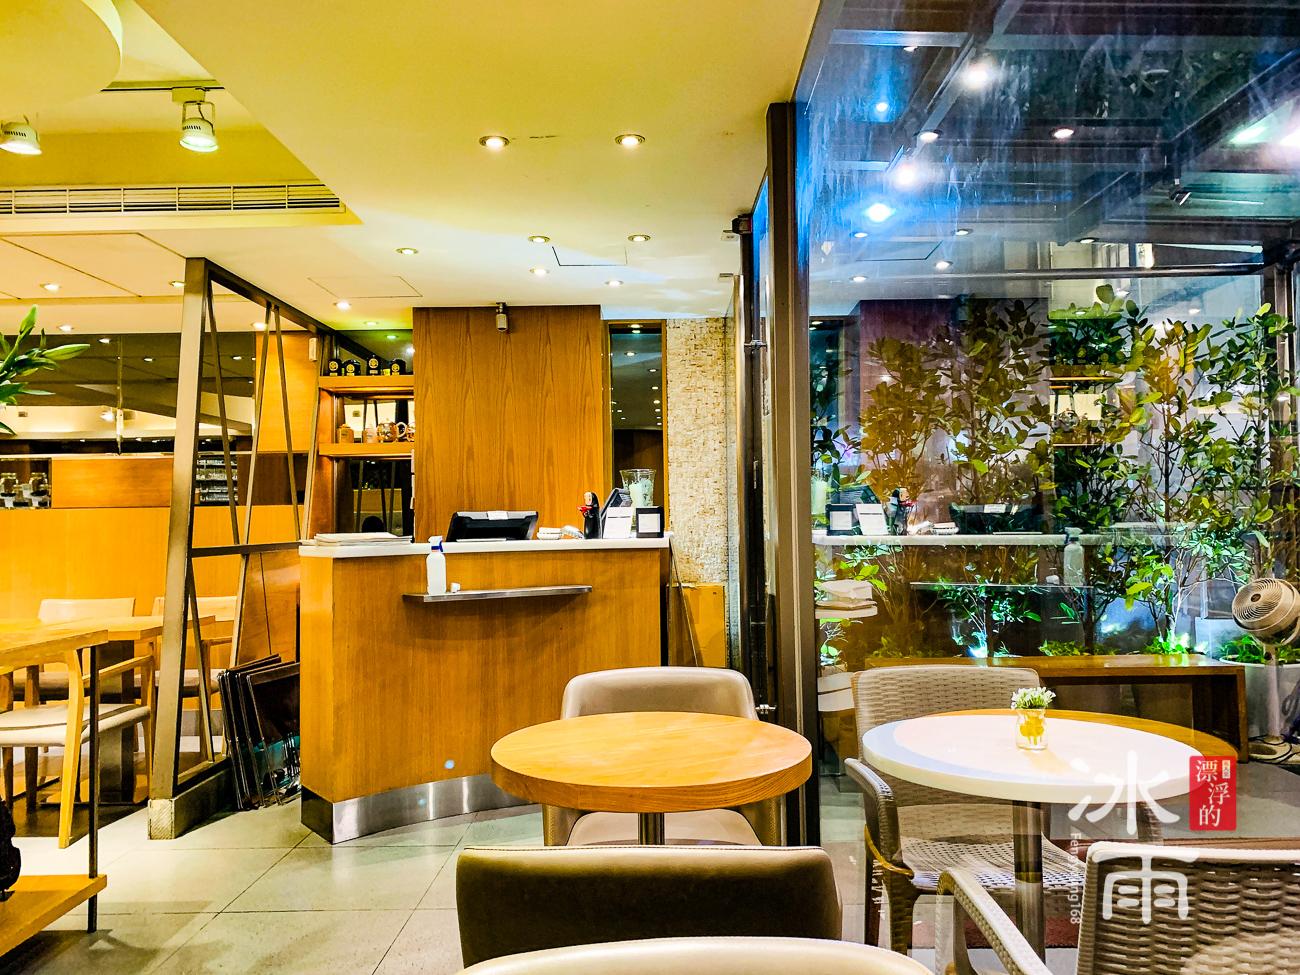 佐曼咖啡Jumane Cafe|結帳區